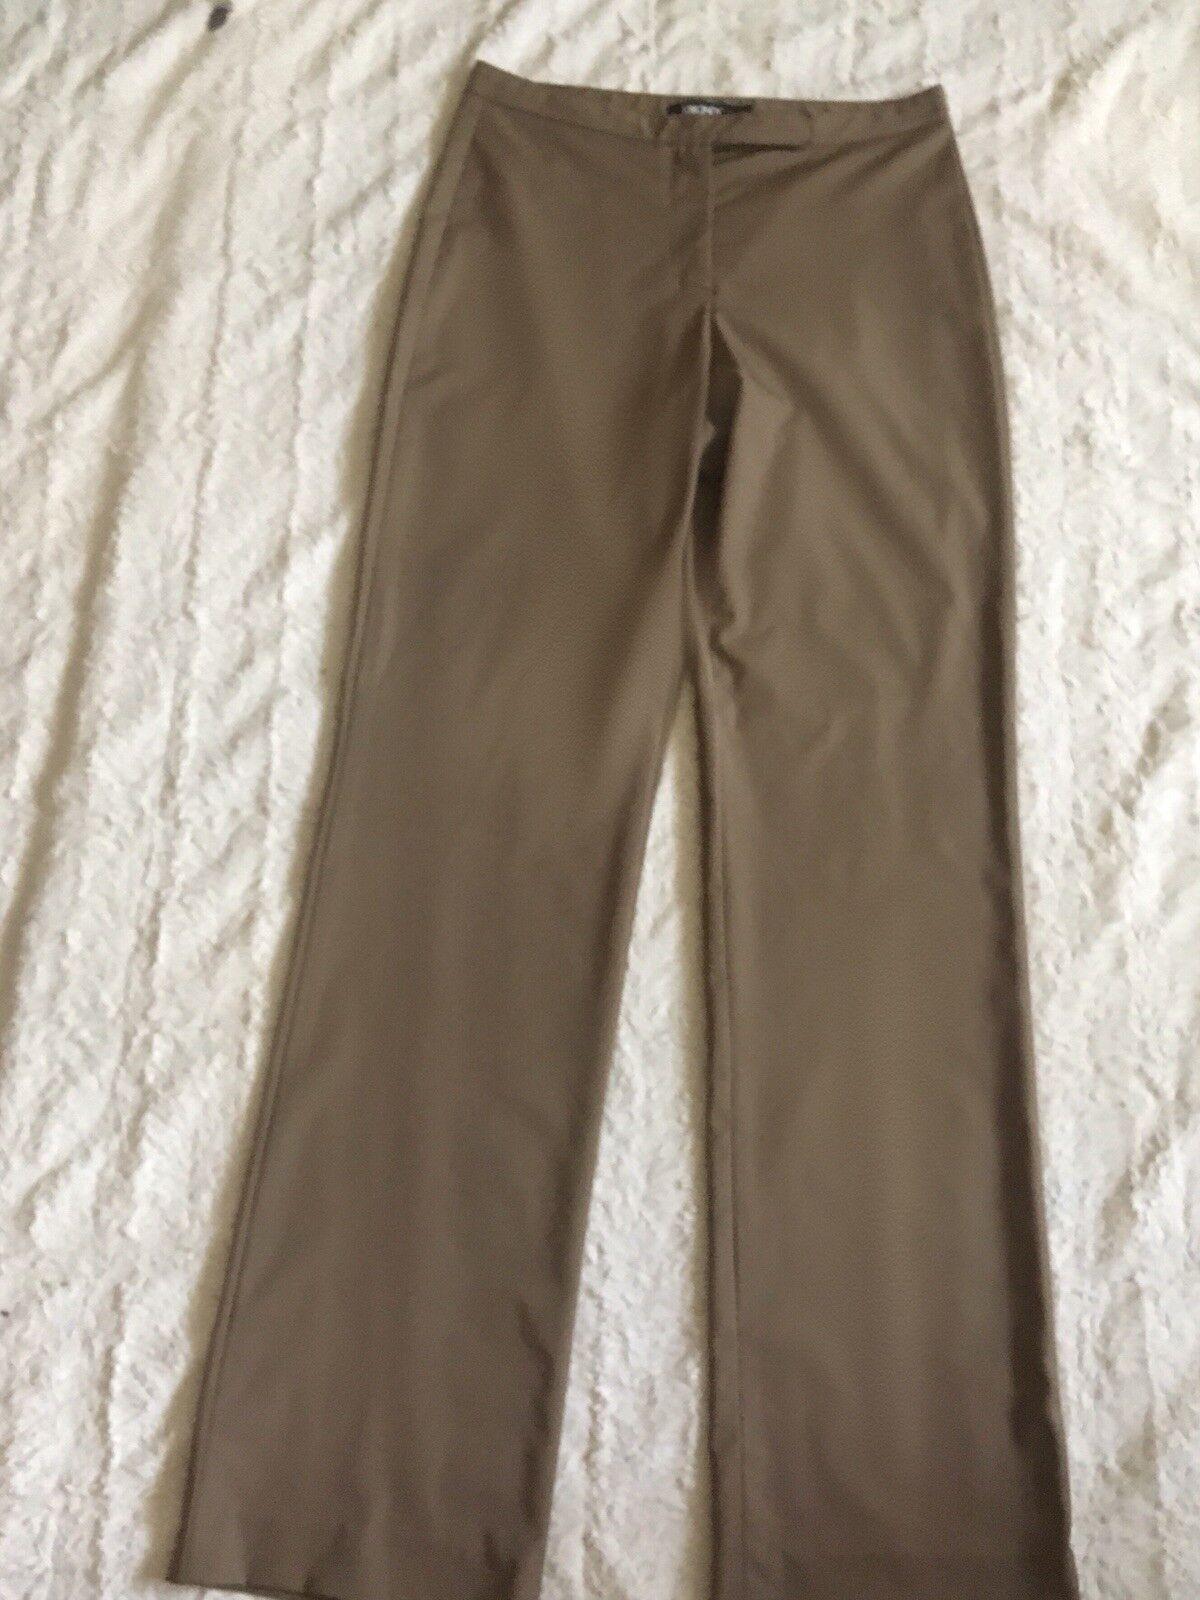 DKNY tan pants size 6